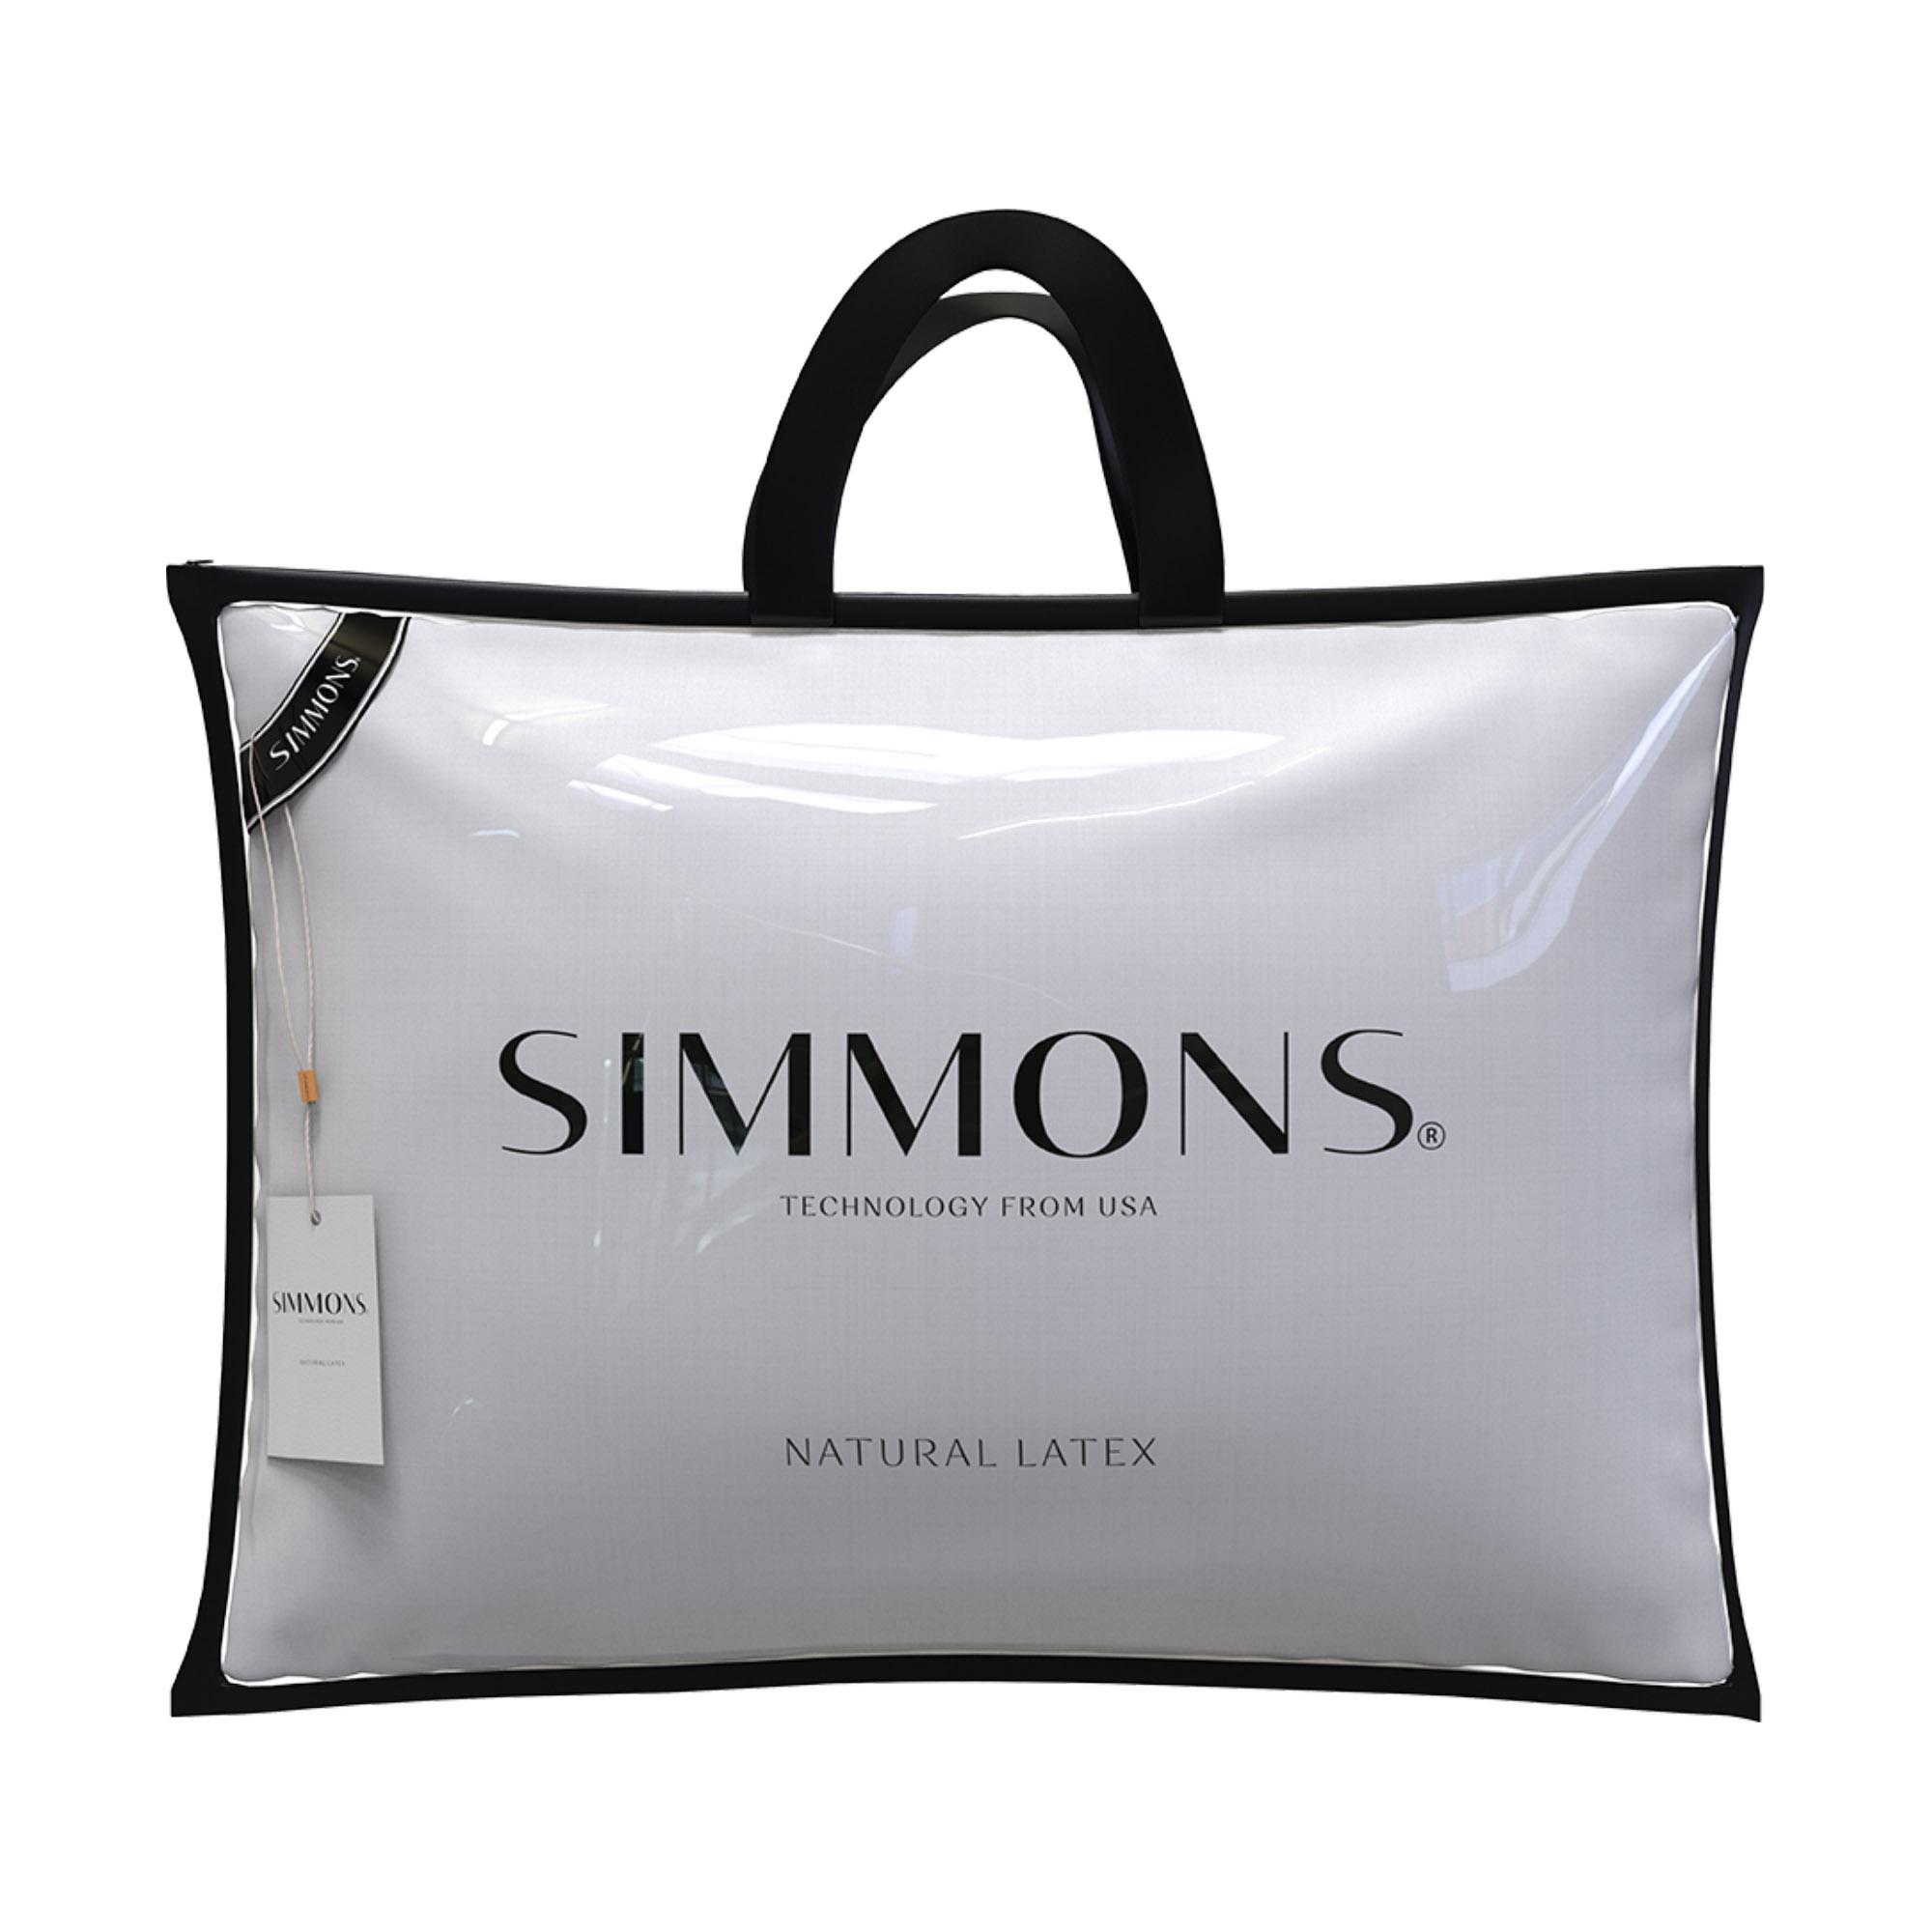 Travesseiro Simmons Natural Látex, 050 x 070 x 014 cm